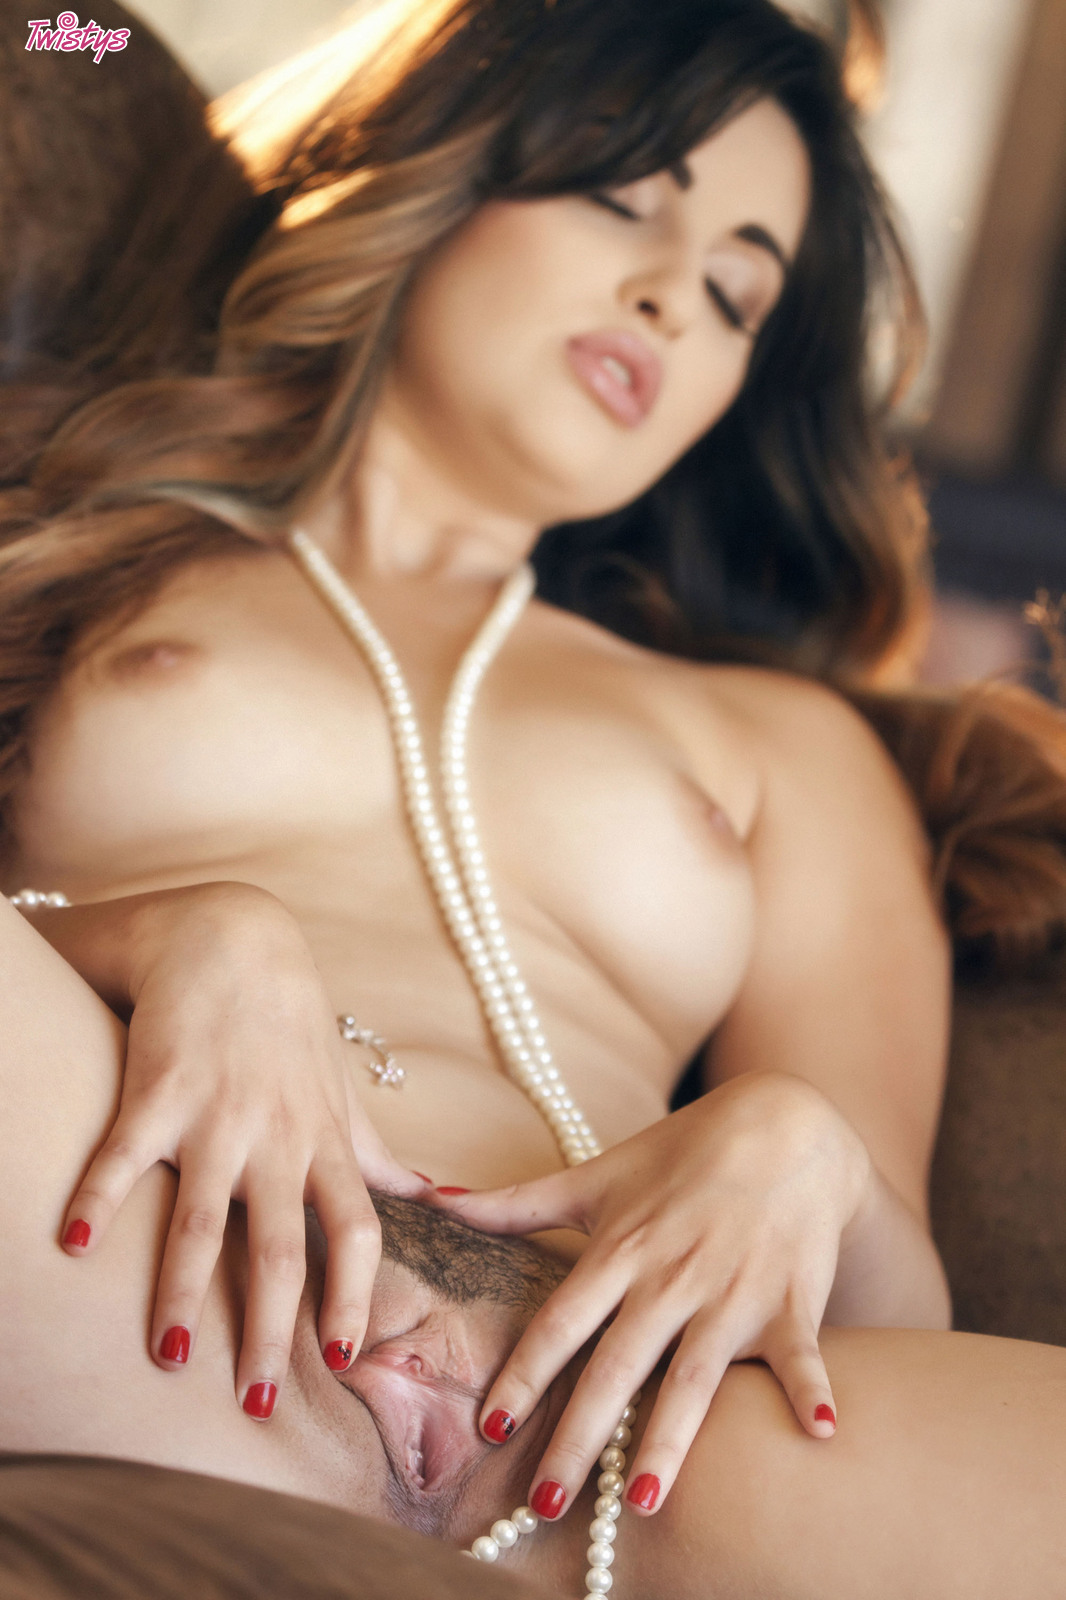 Natasha malkova nude